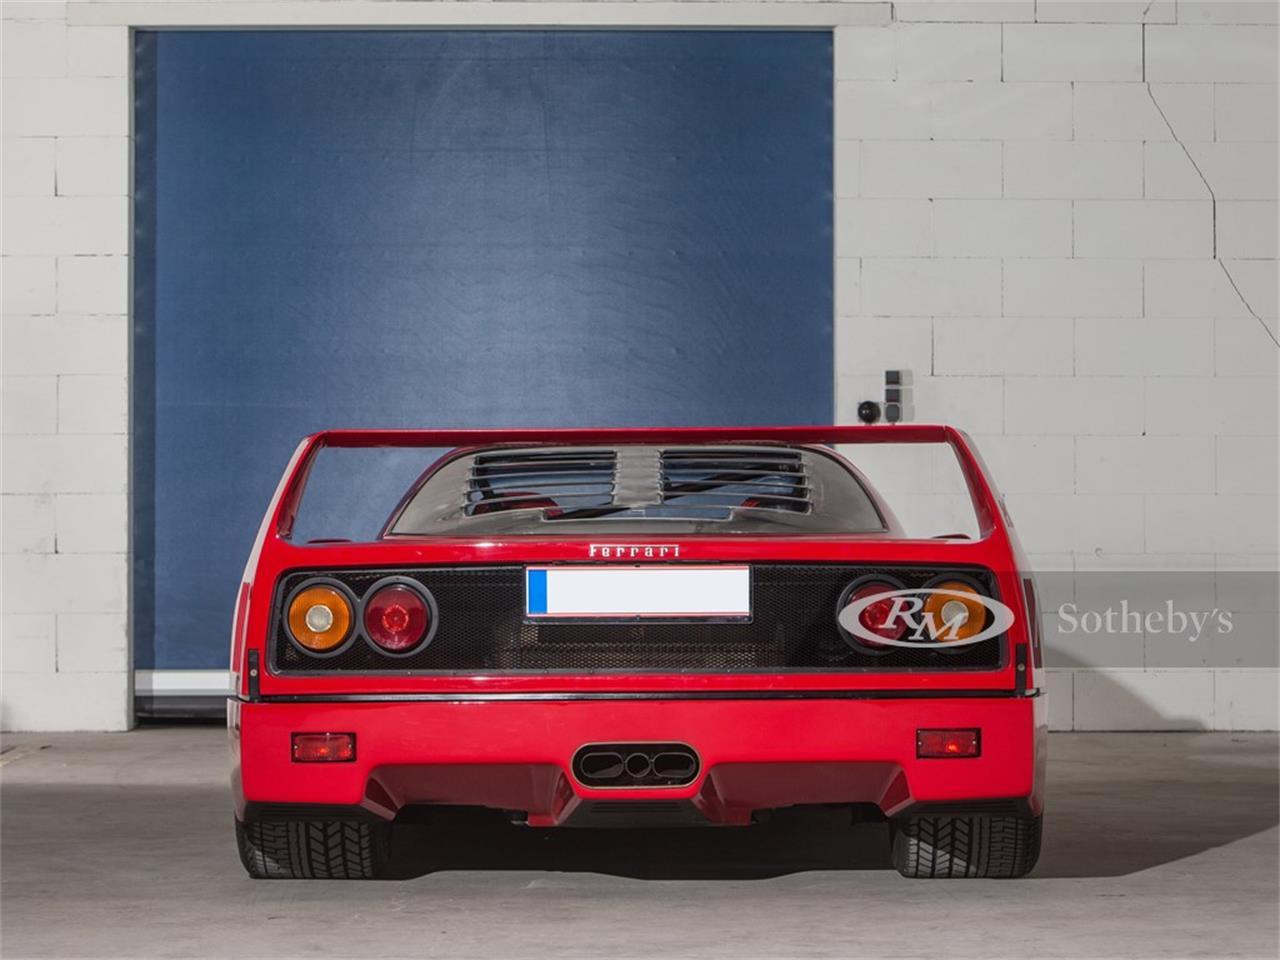 1990 Ferrari F40 (CC-1413889) for sale in London, United Kingdom